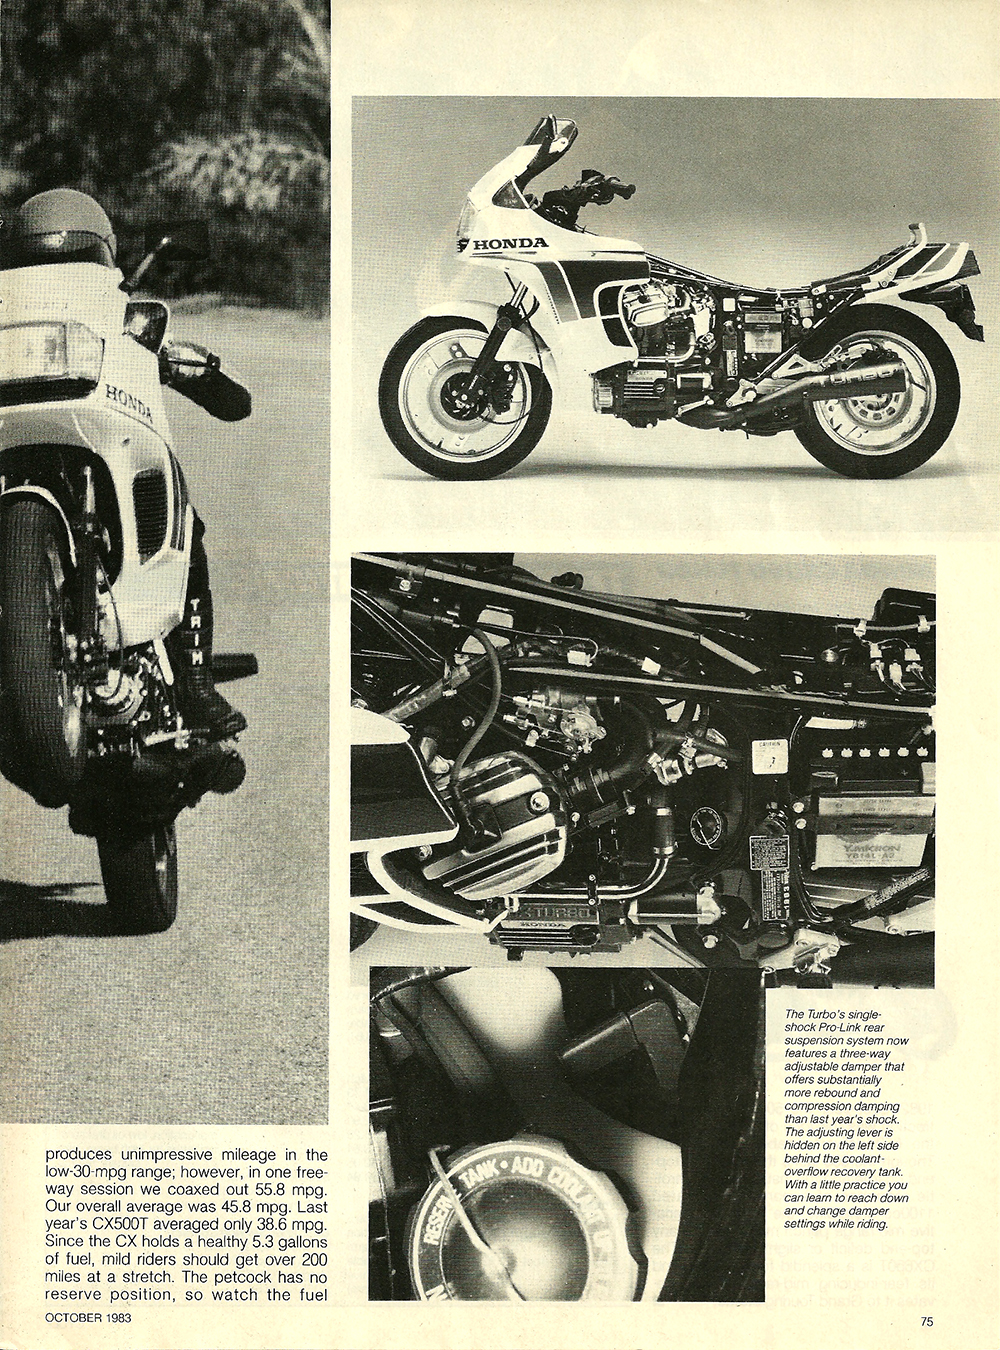 1983 Honda CX650 turbo road test 6.jpg